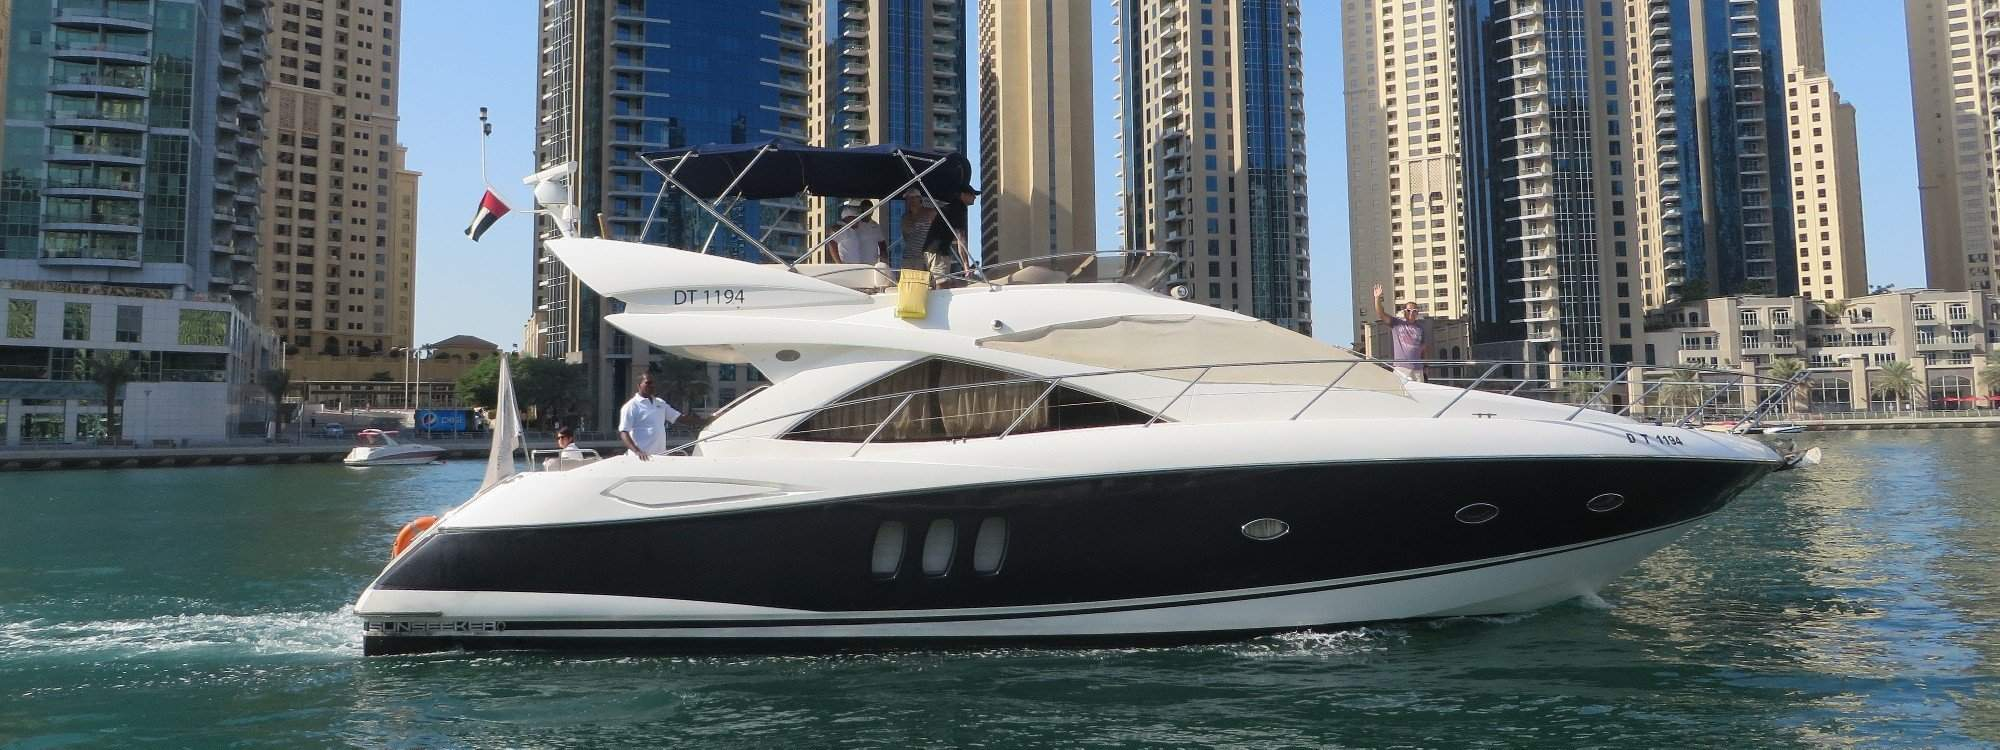 The IYT Maritime Training Center in Dubai